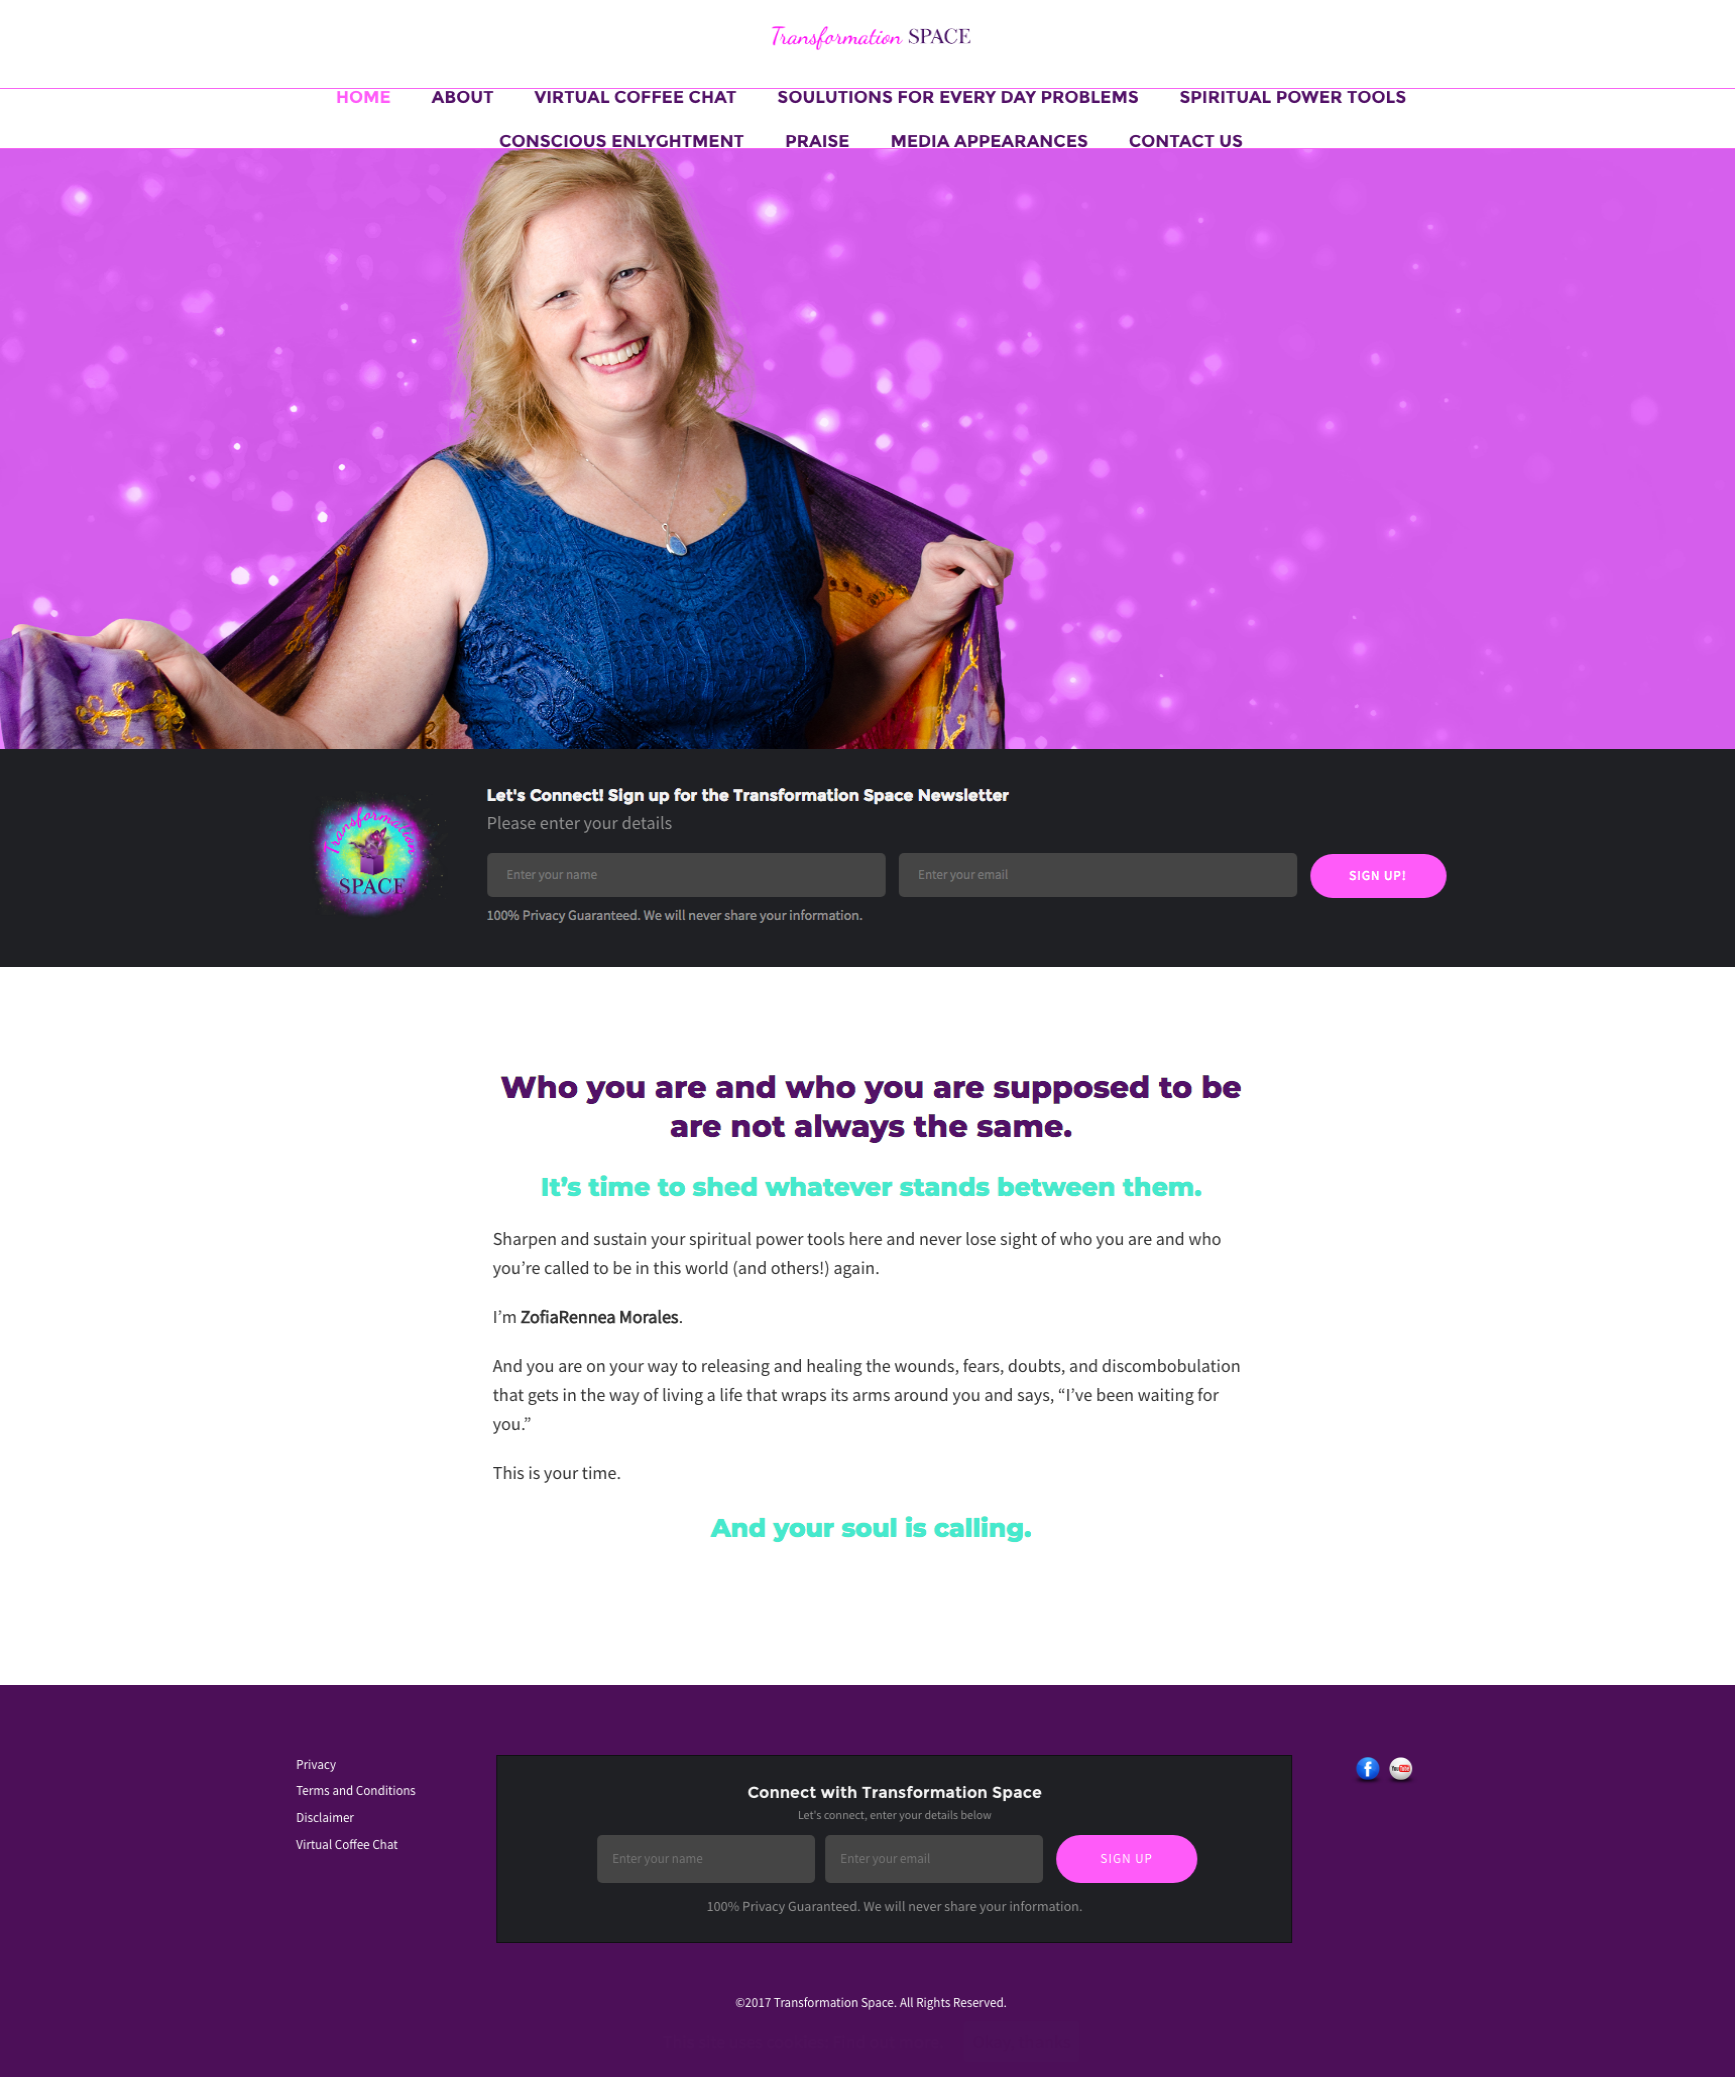 screenshot-transformationspace.co-2018.09.26-23-43-56.png